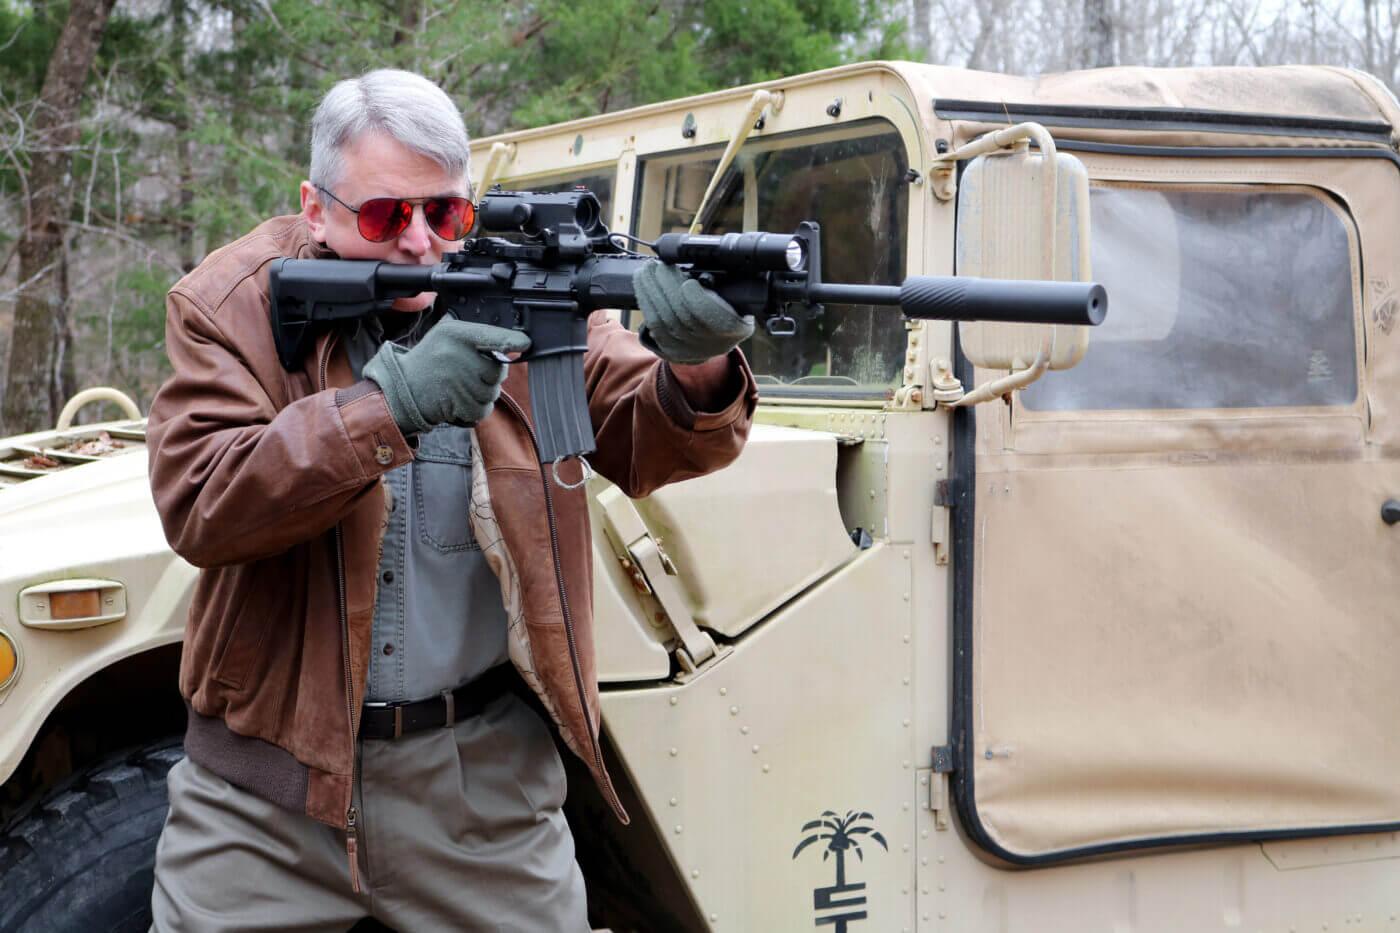 Shooting an NcSTAR VISM ECO MOD2 mounted on a Springfield SAINT rifle